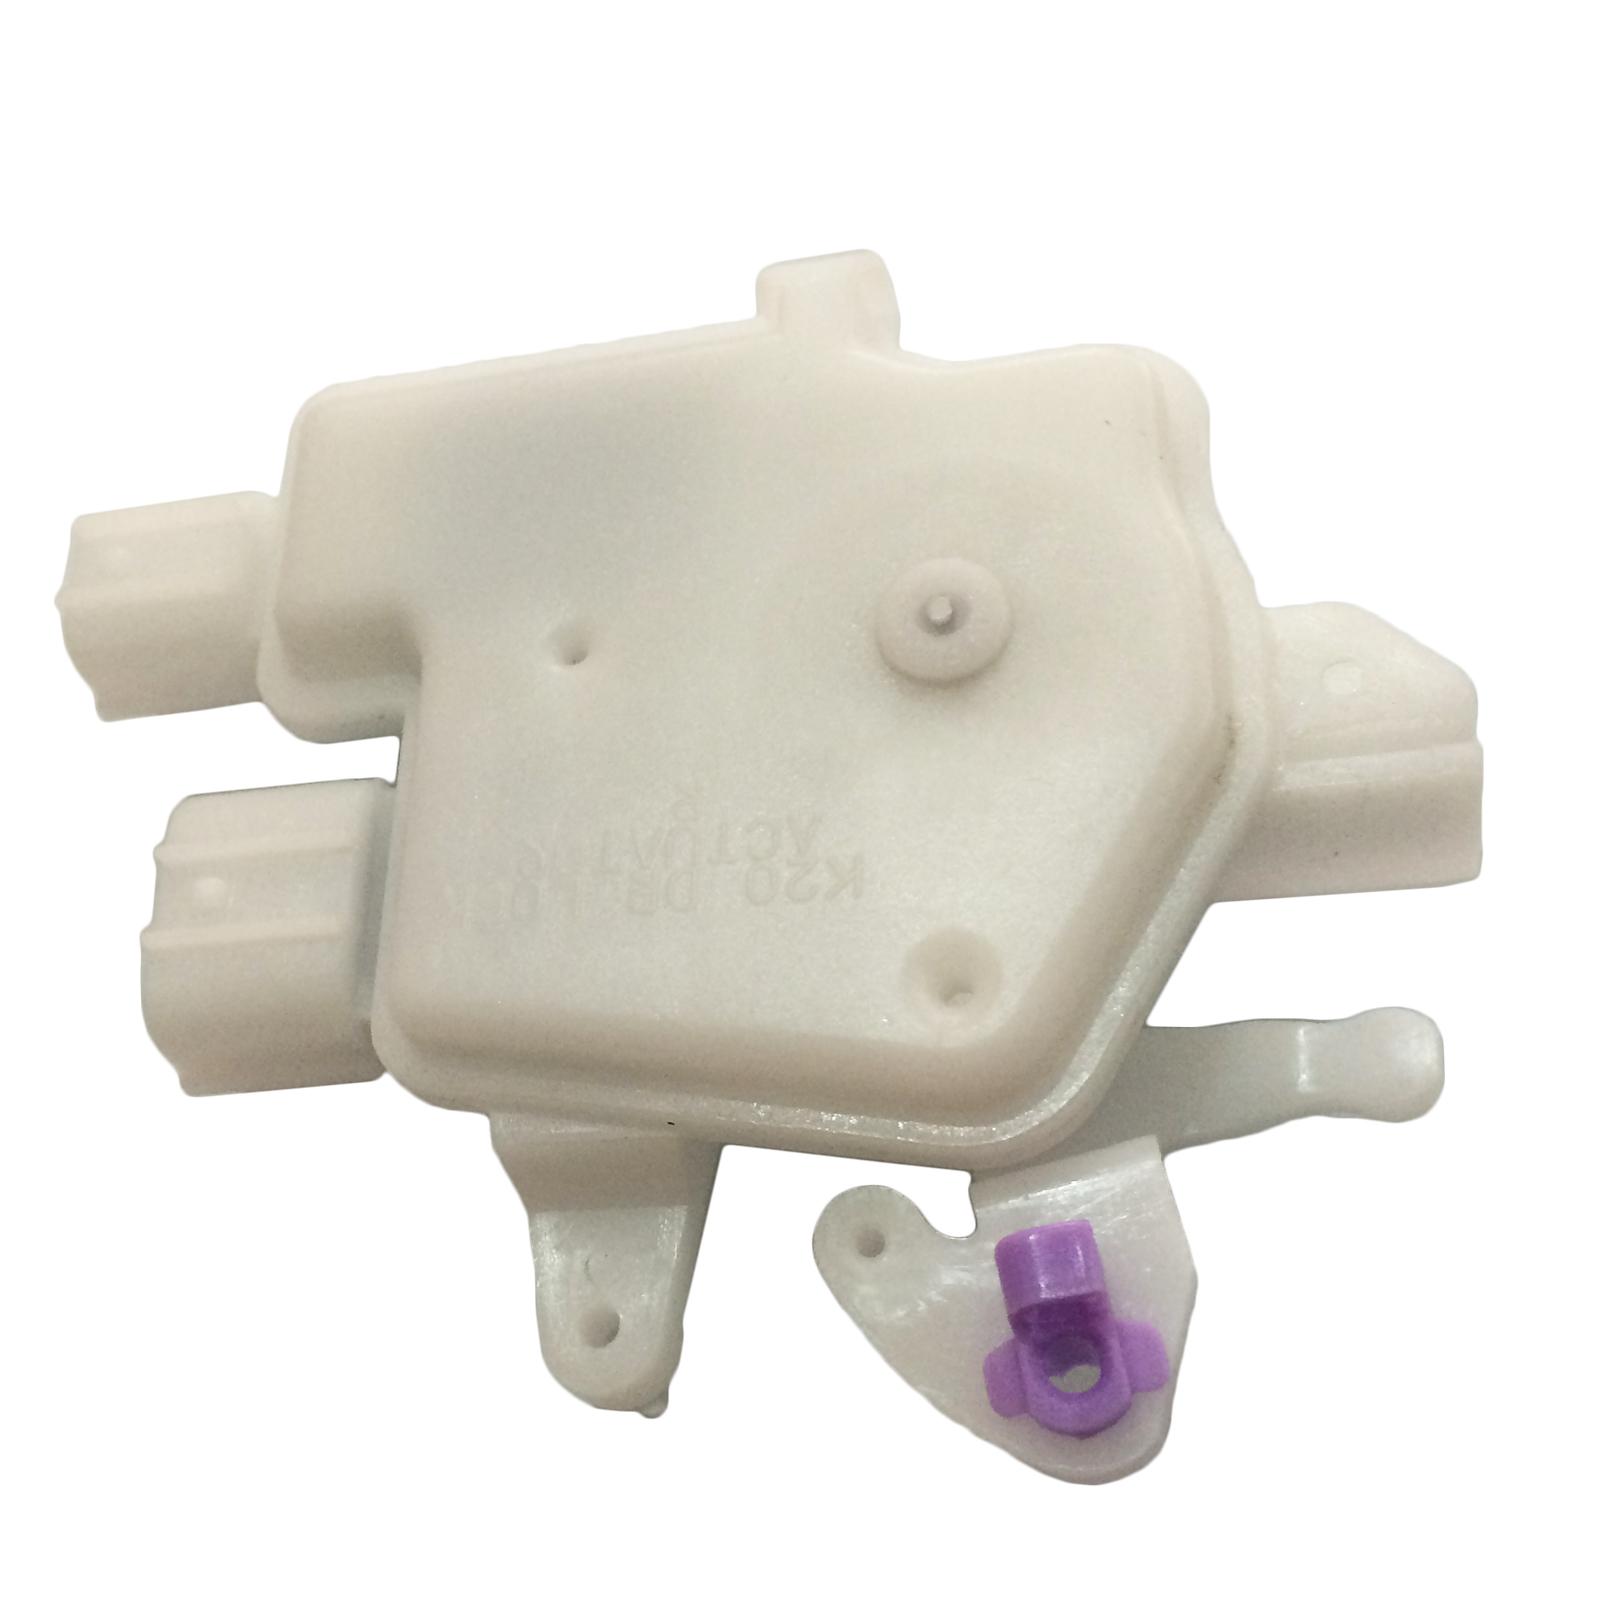 toyota landcruiser hj60 electrical wiring diagrams pdf